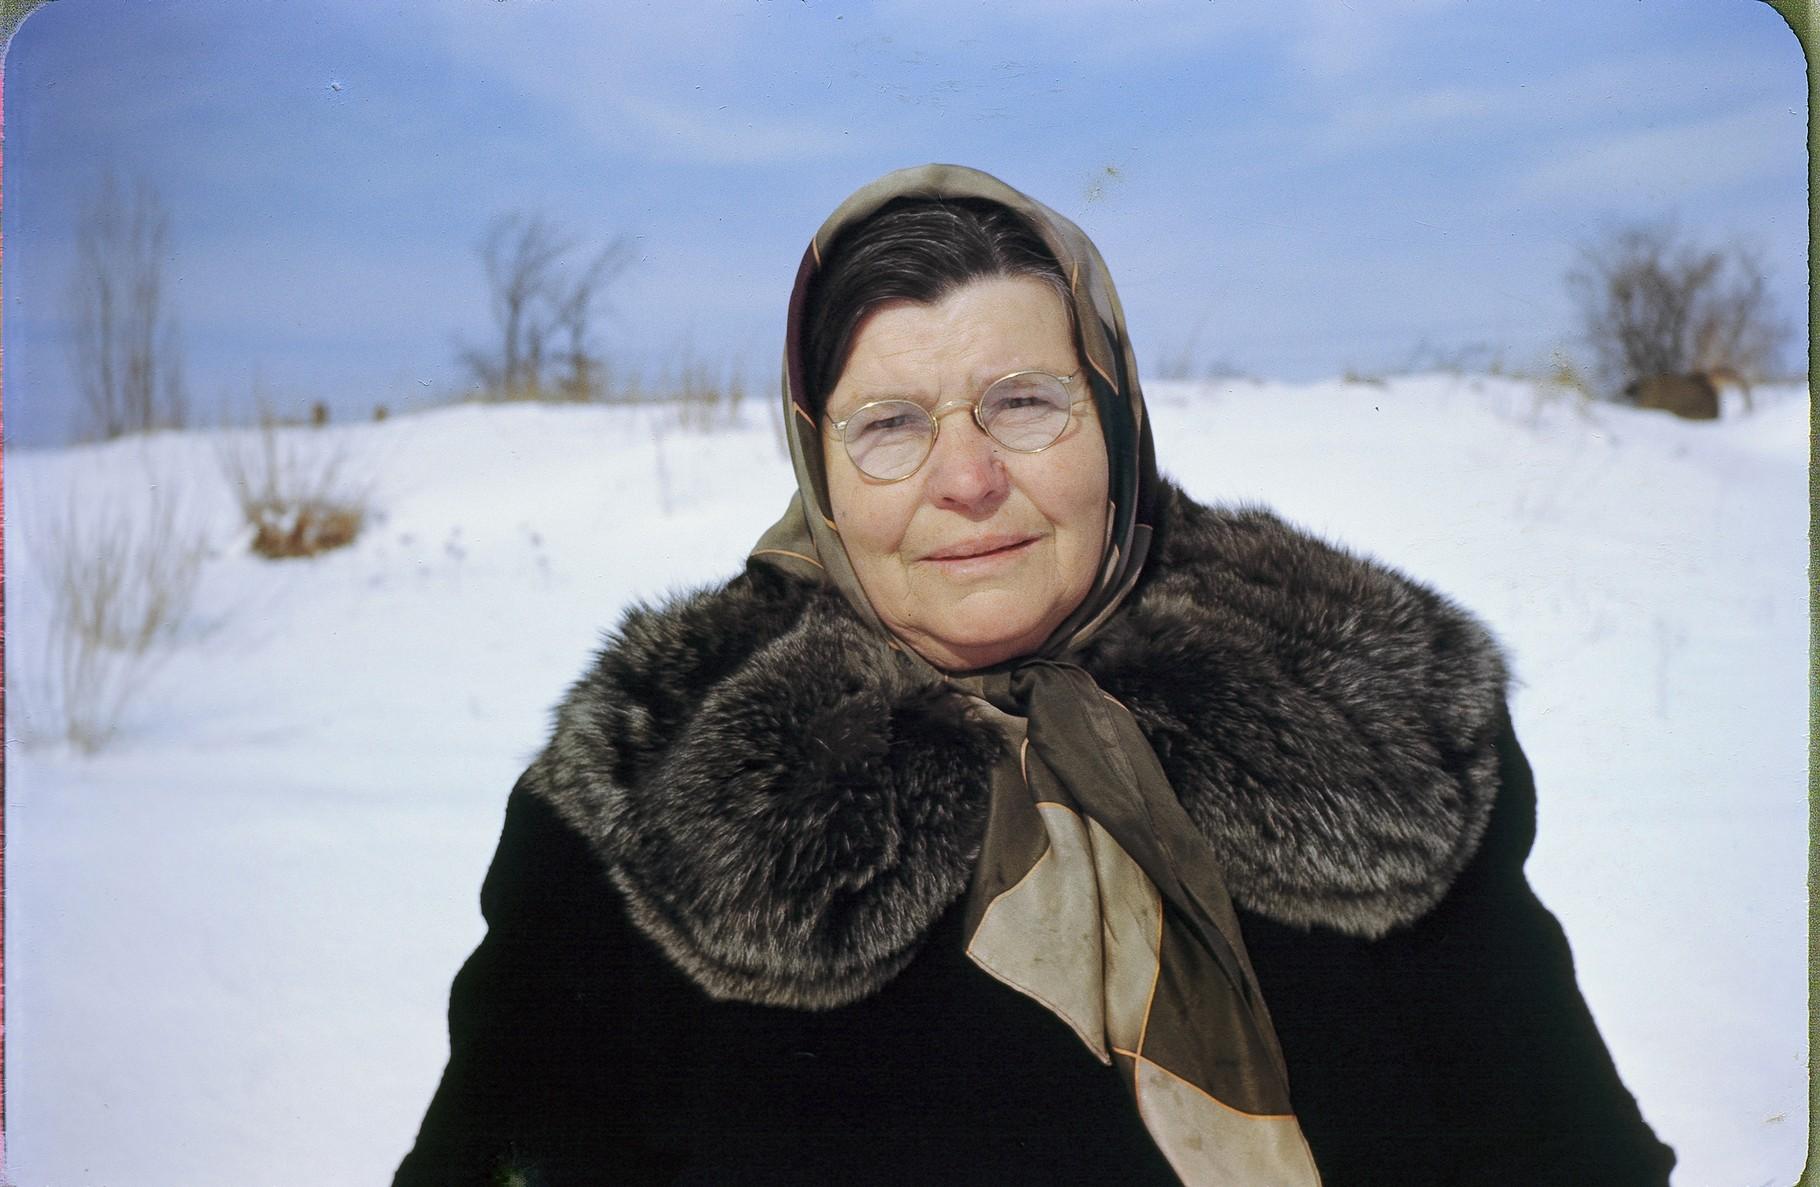 Helen Gudeczauskas, Lorraine & Celeste's grandmother, Albert's mom